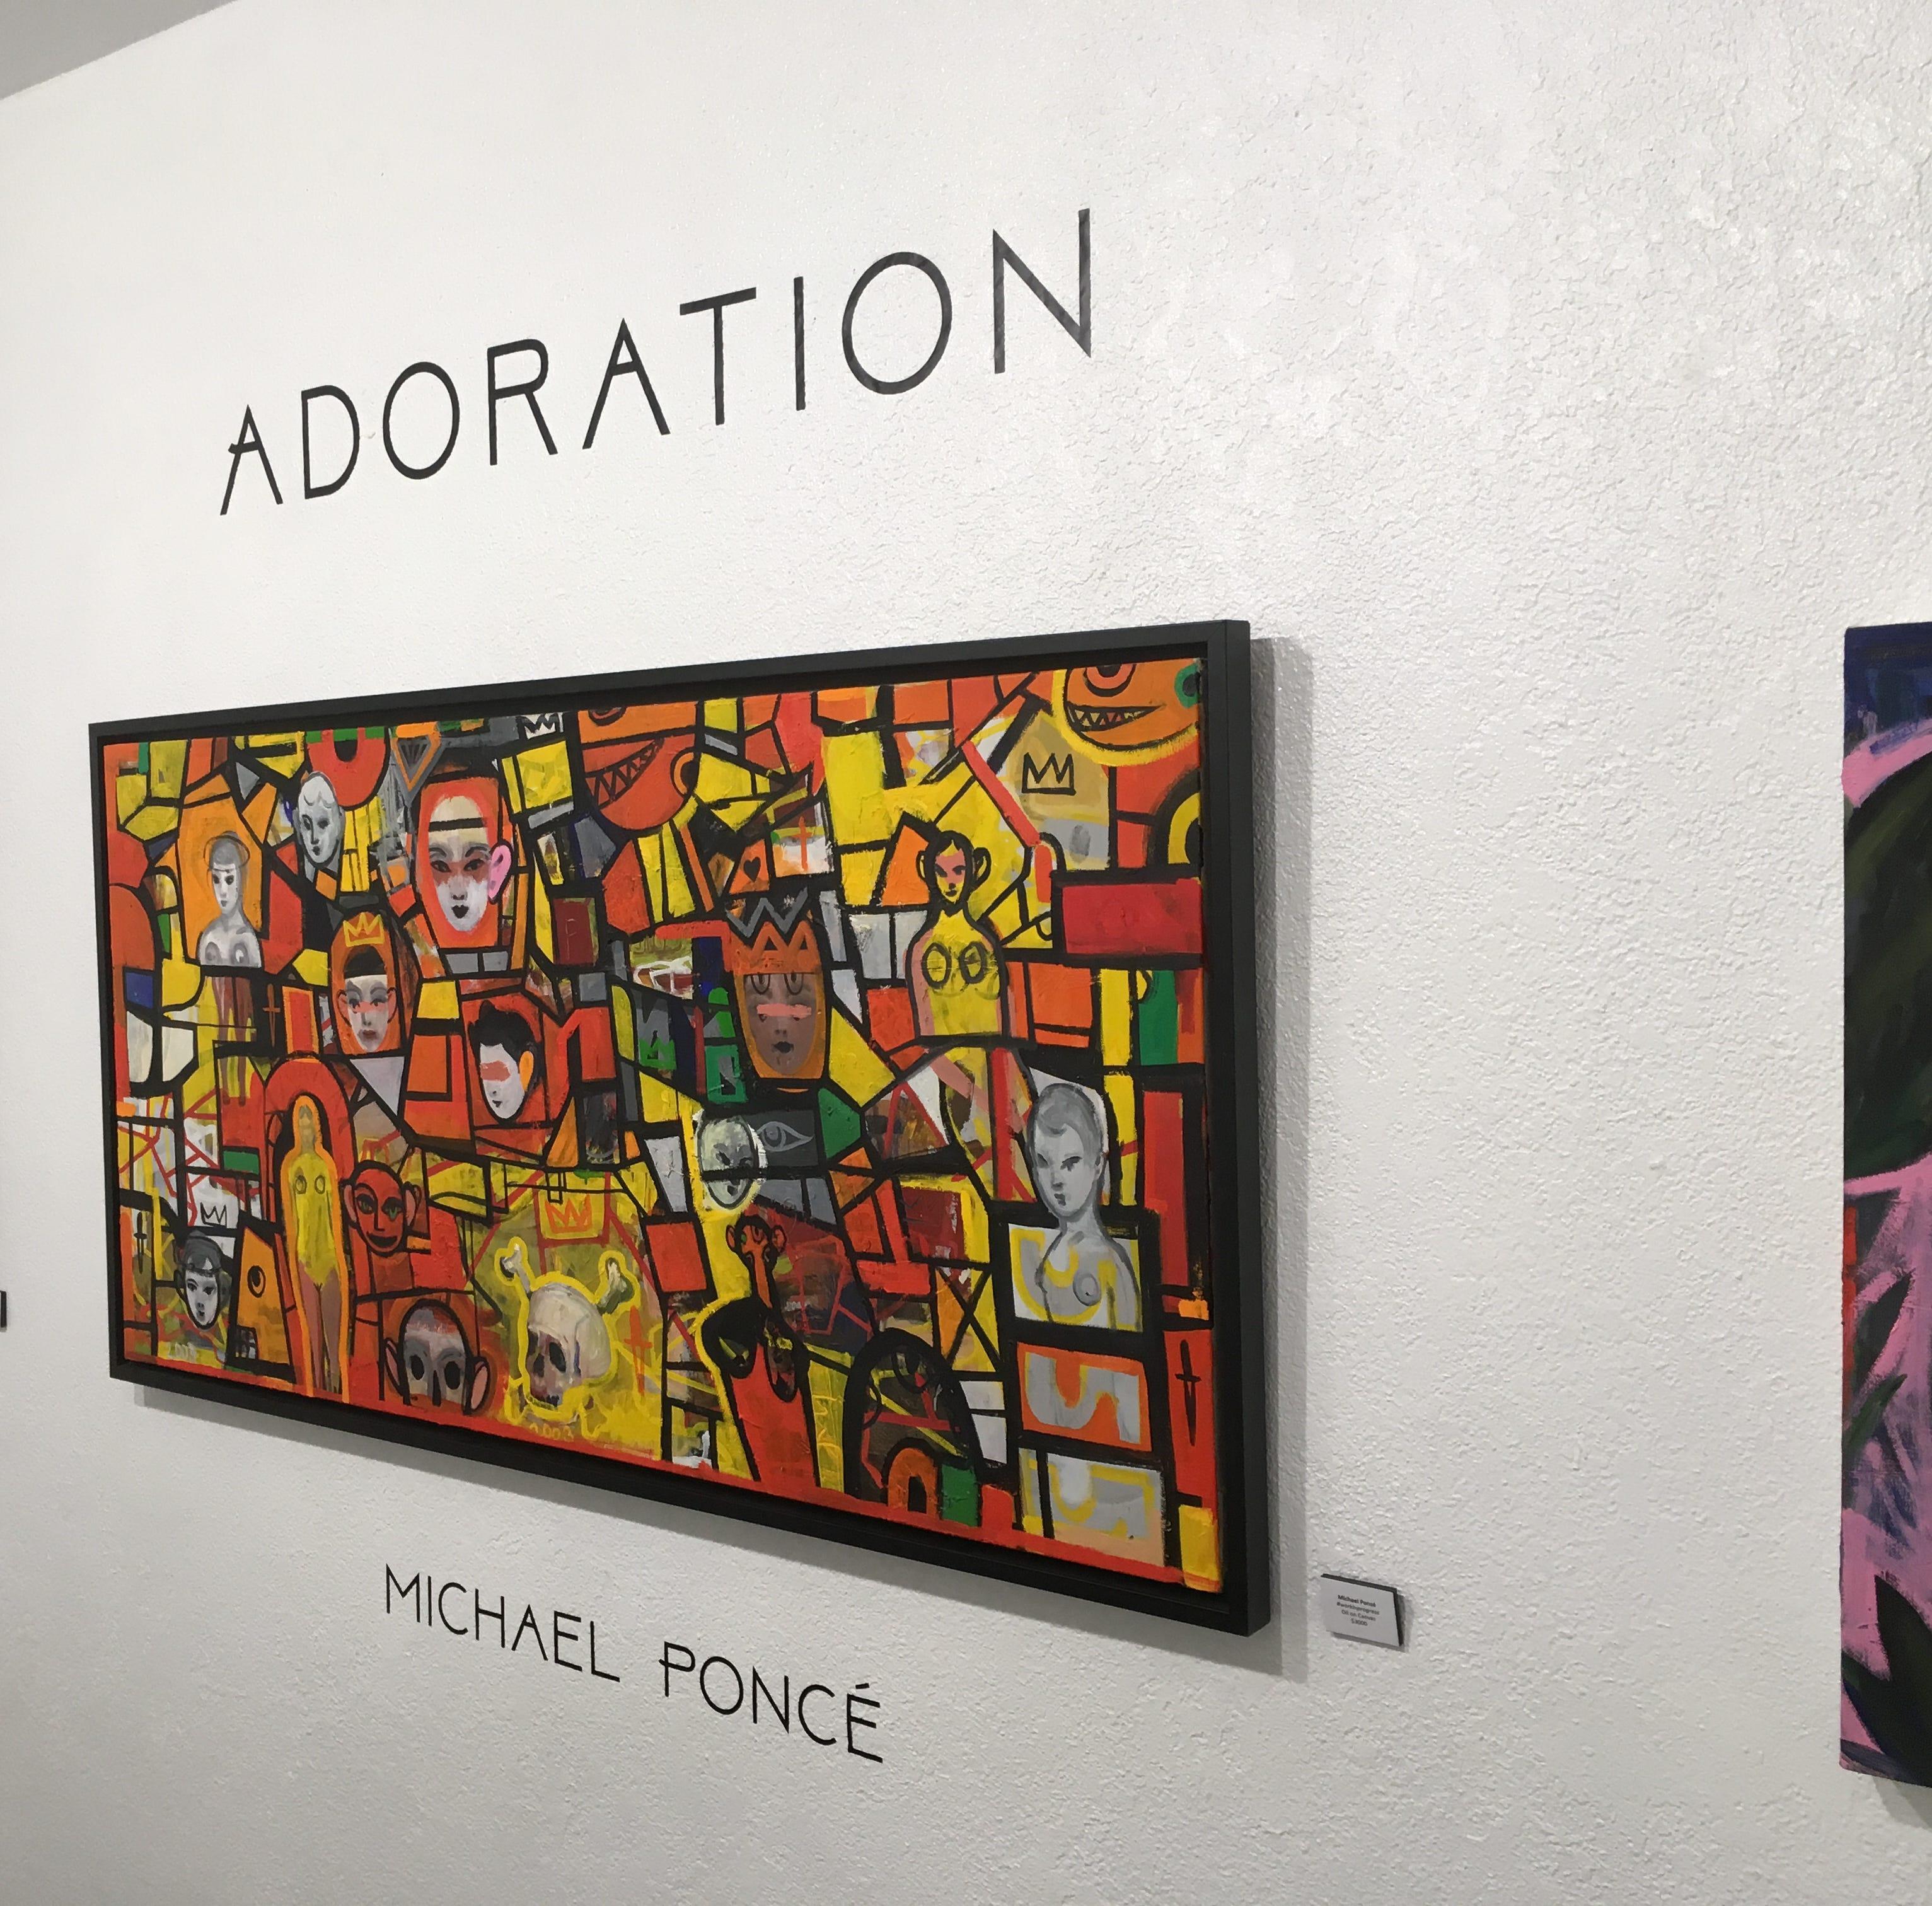 'Adoration' art show explores numerous sides of one model